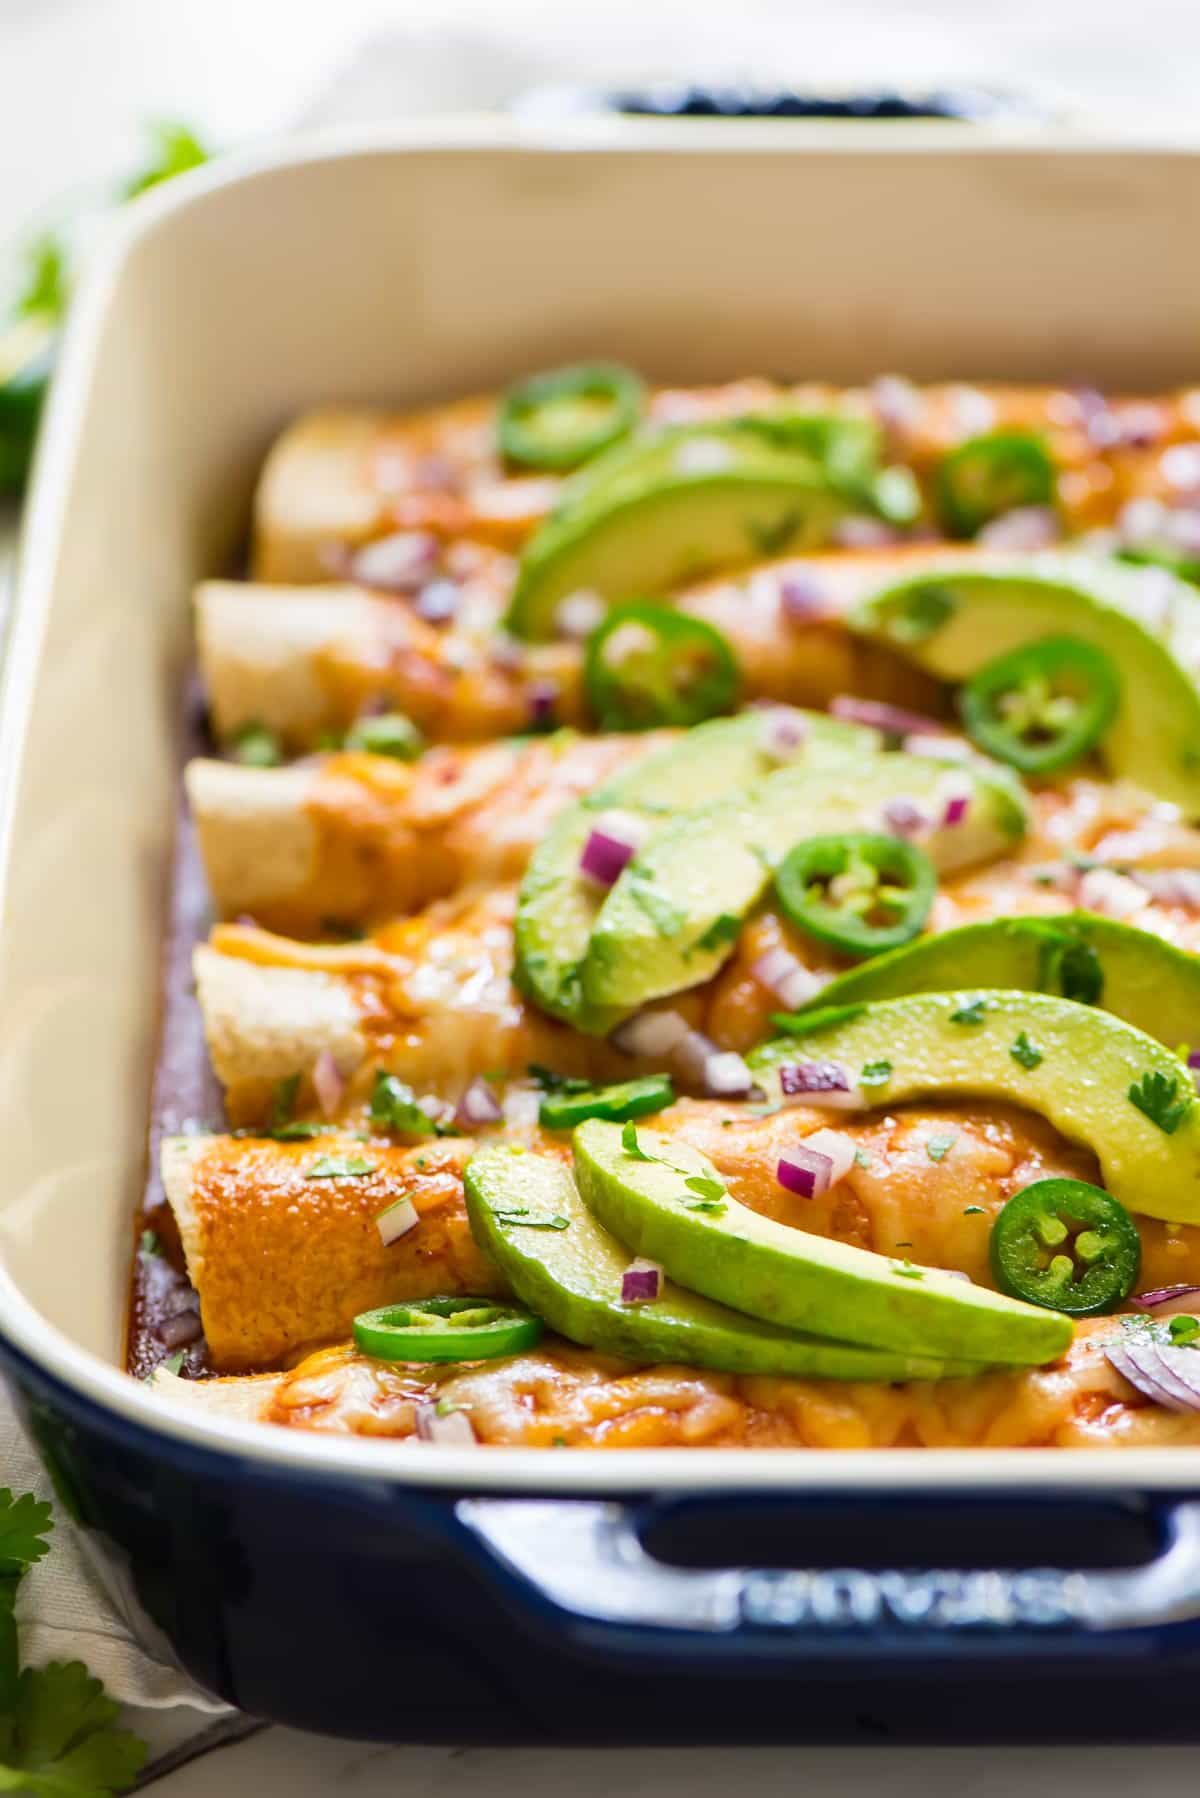 Spicy vegetarian enchiladas with avocado